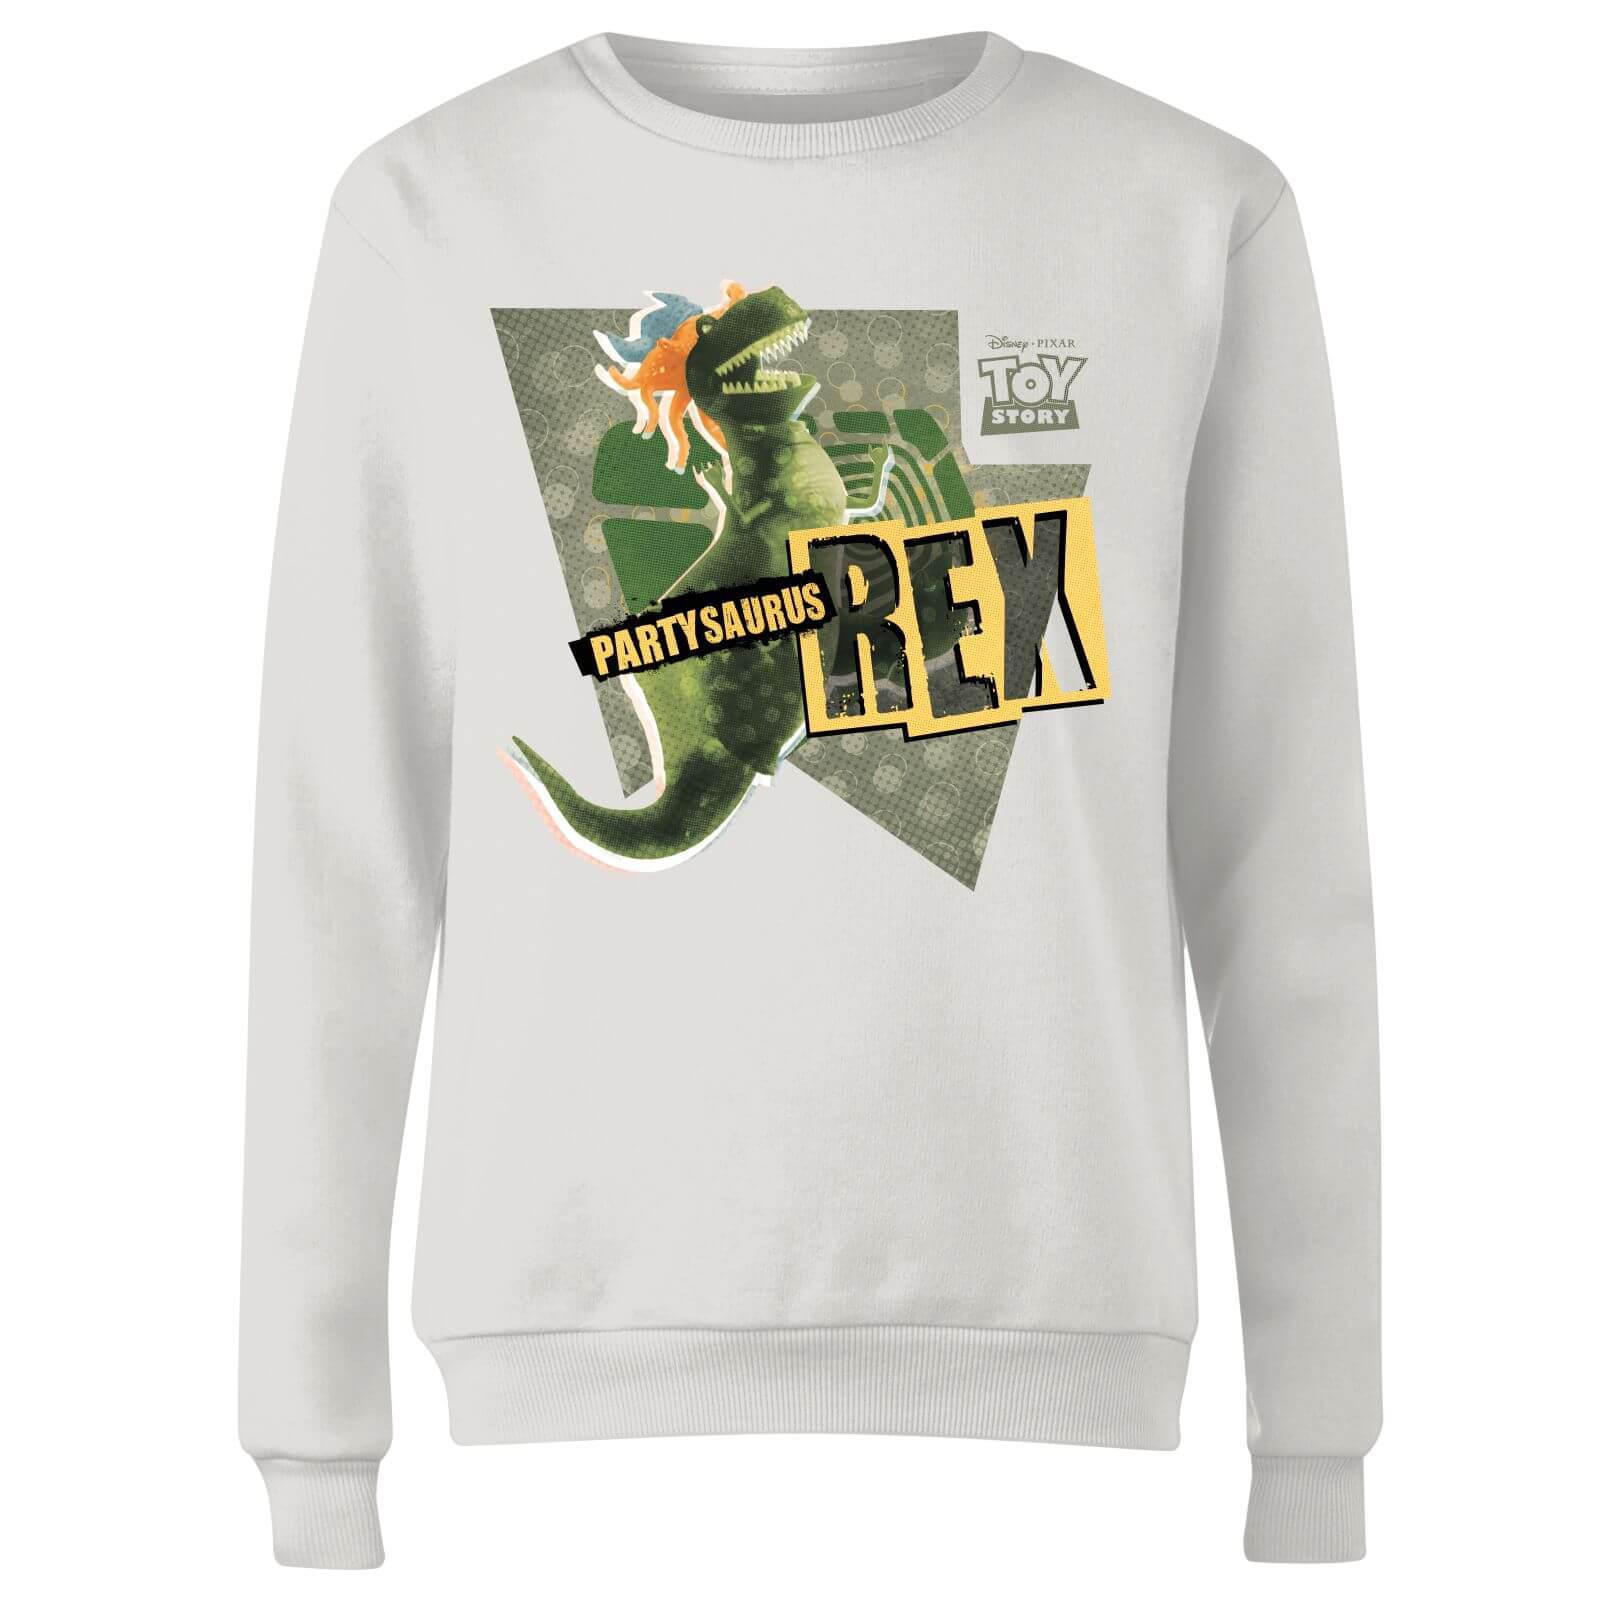 77d792a26ed Disney - White Toy Story Partysaurus Rex Sweatshirt - Lyst. View fullscreen